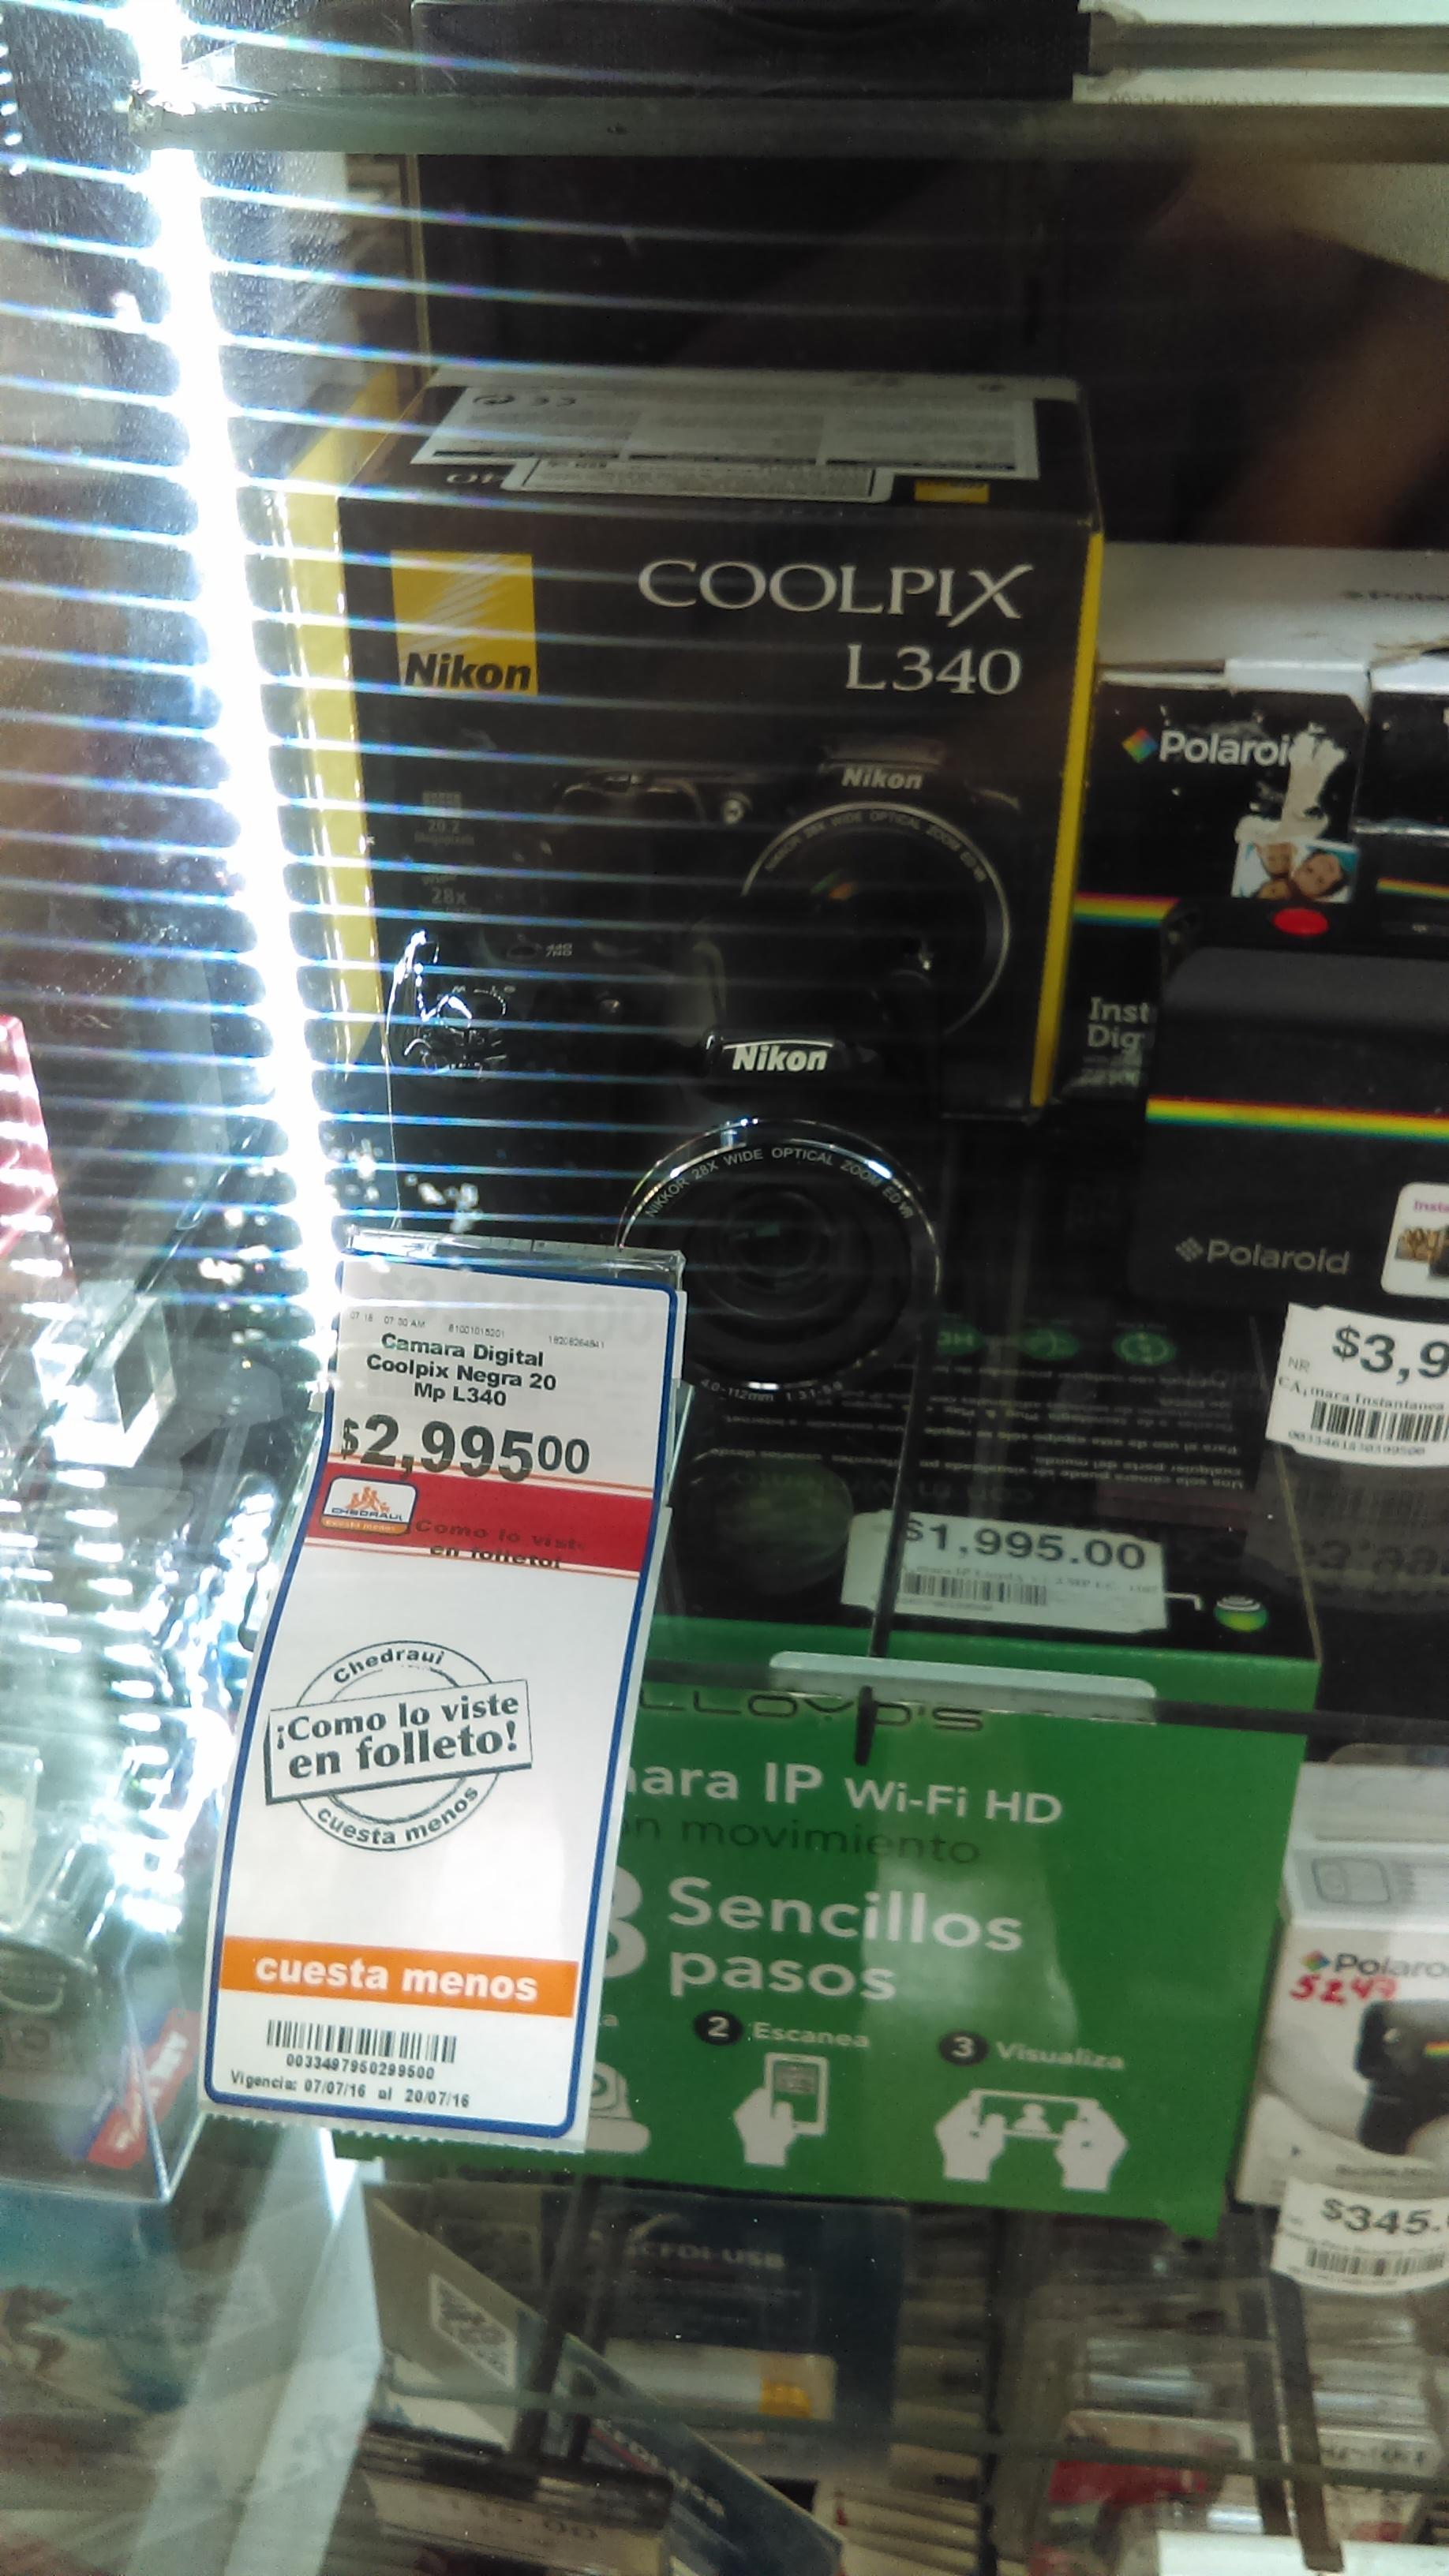 Chedraui: Camara Nikon Coolpix L340 a $2,995